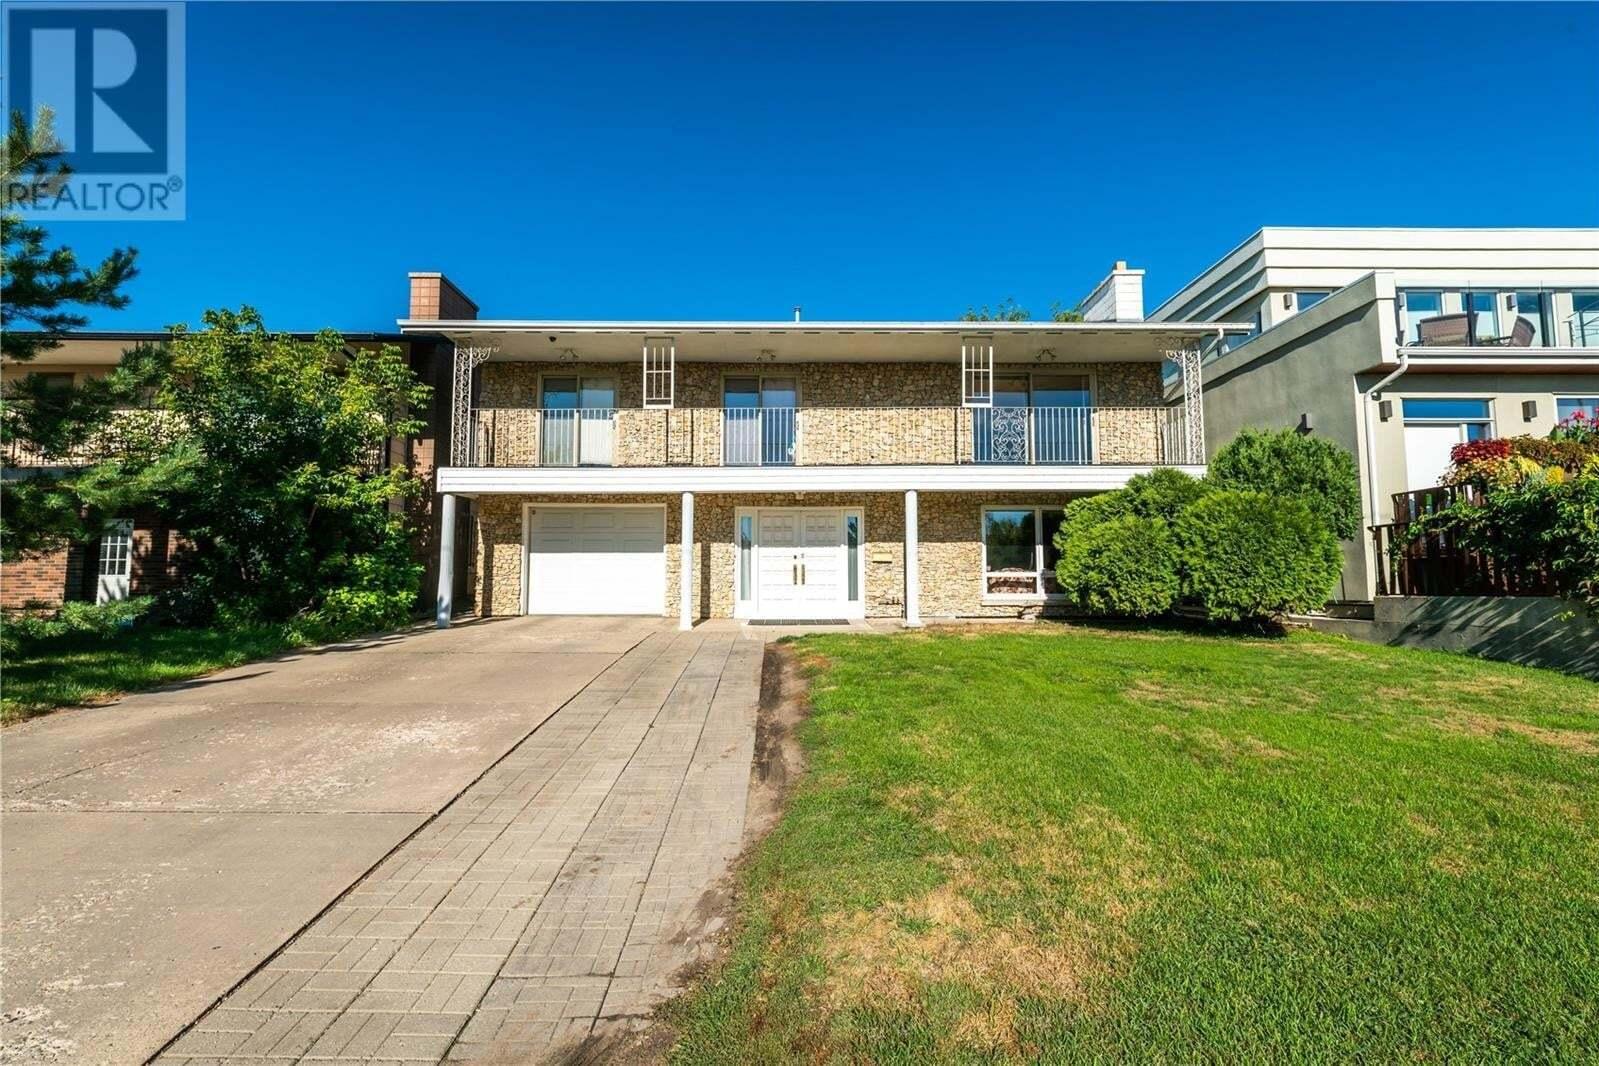 House for sale at 1407 Spadina Cres E Saskatoon Saskatchewan - MLS: SK826039